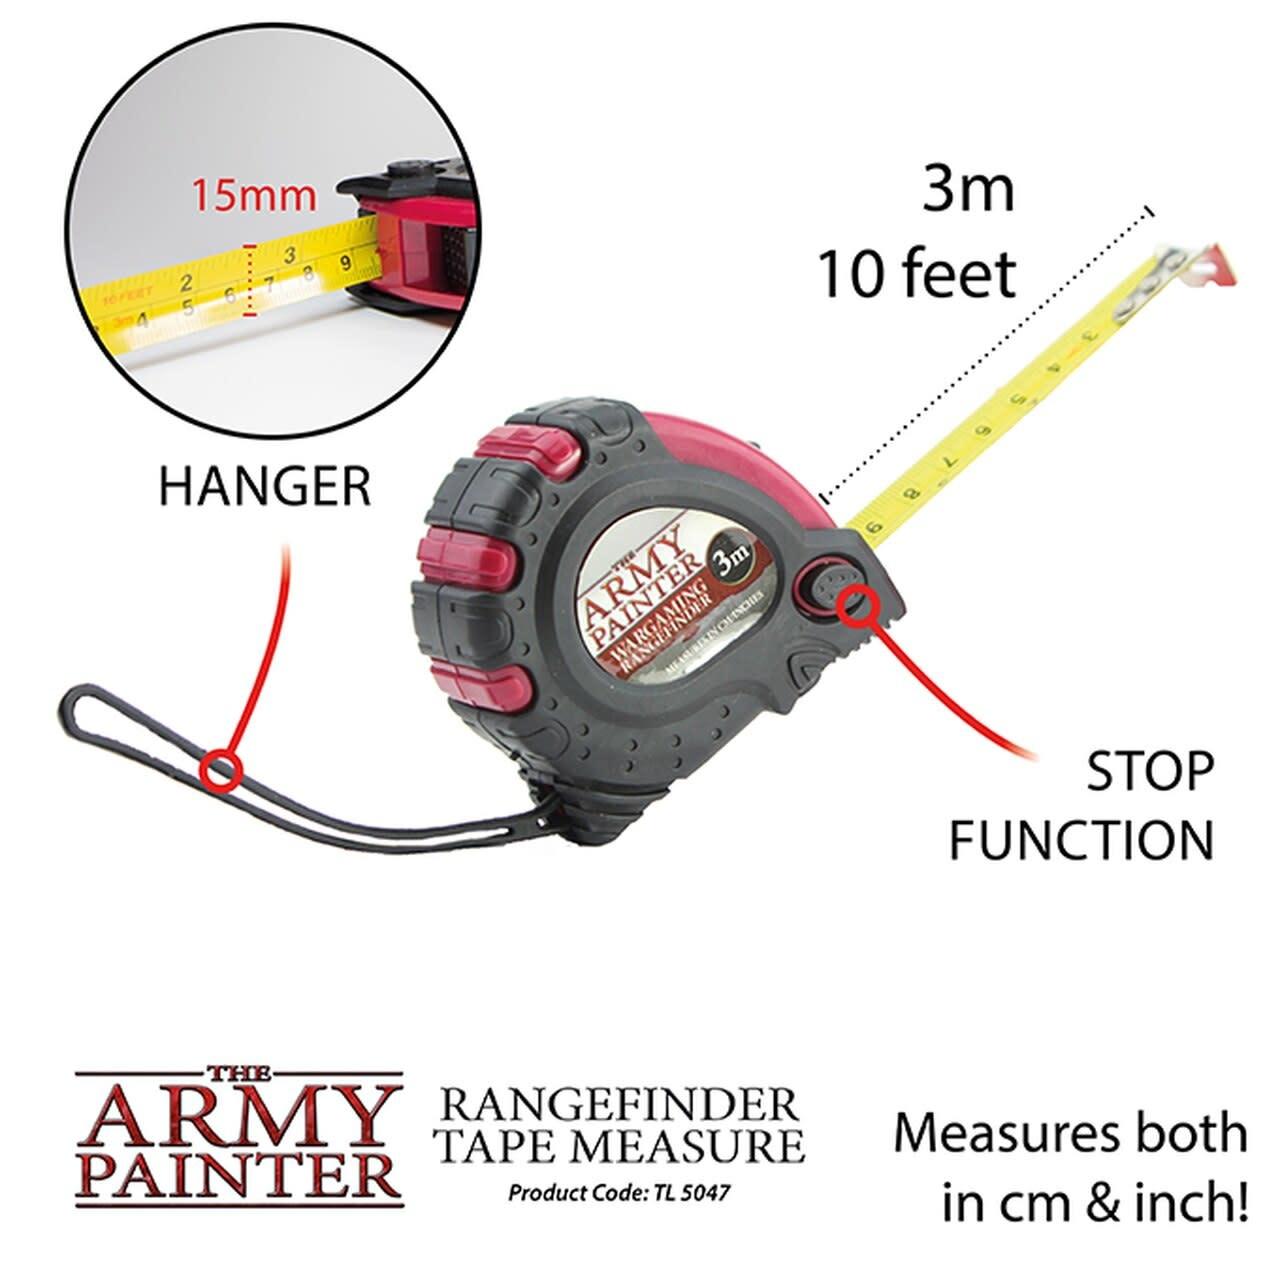 Army Painter Tape Measure